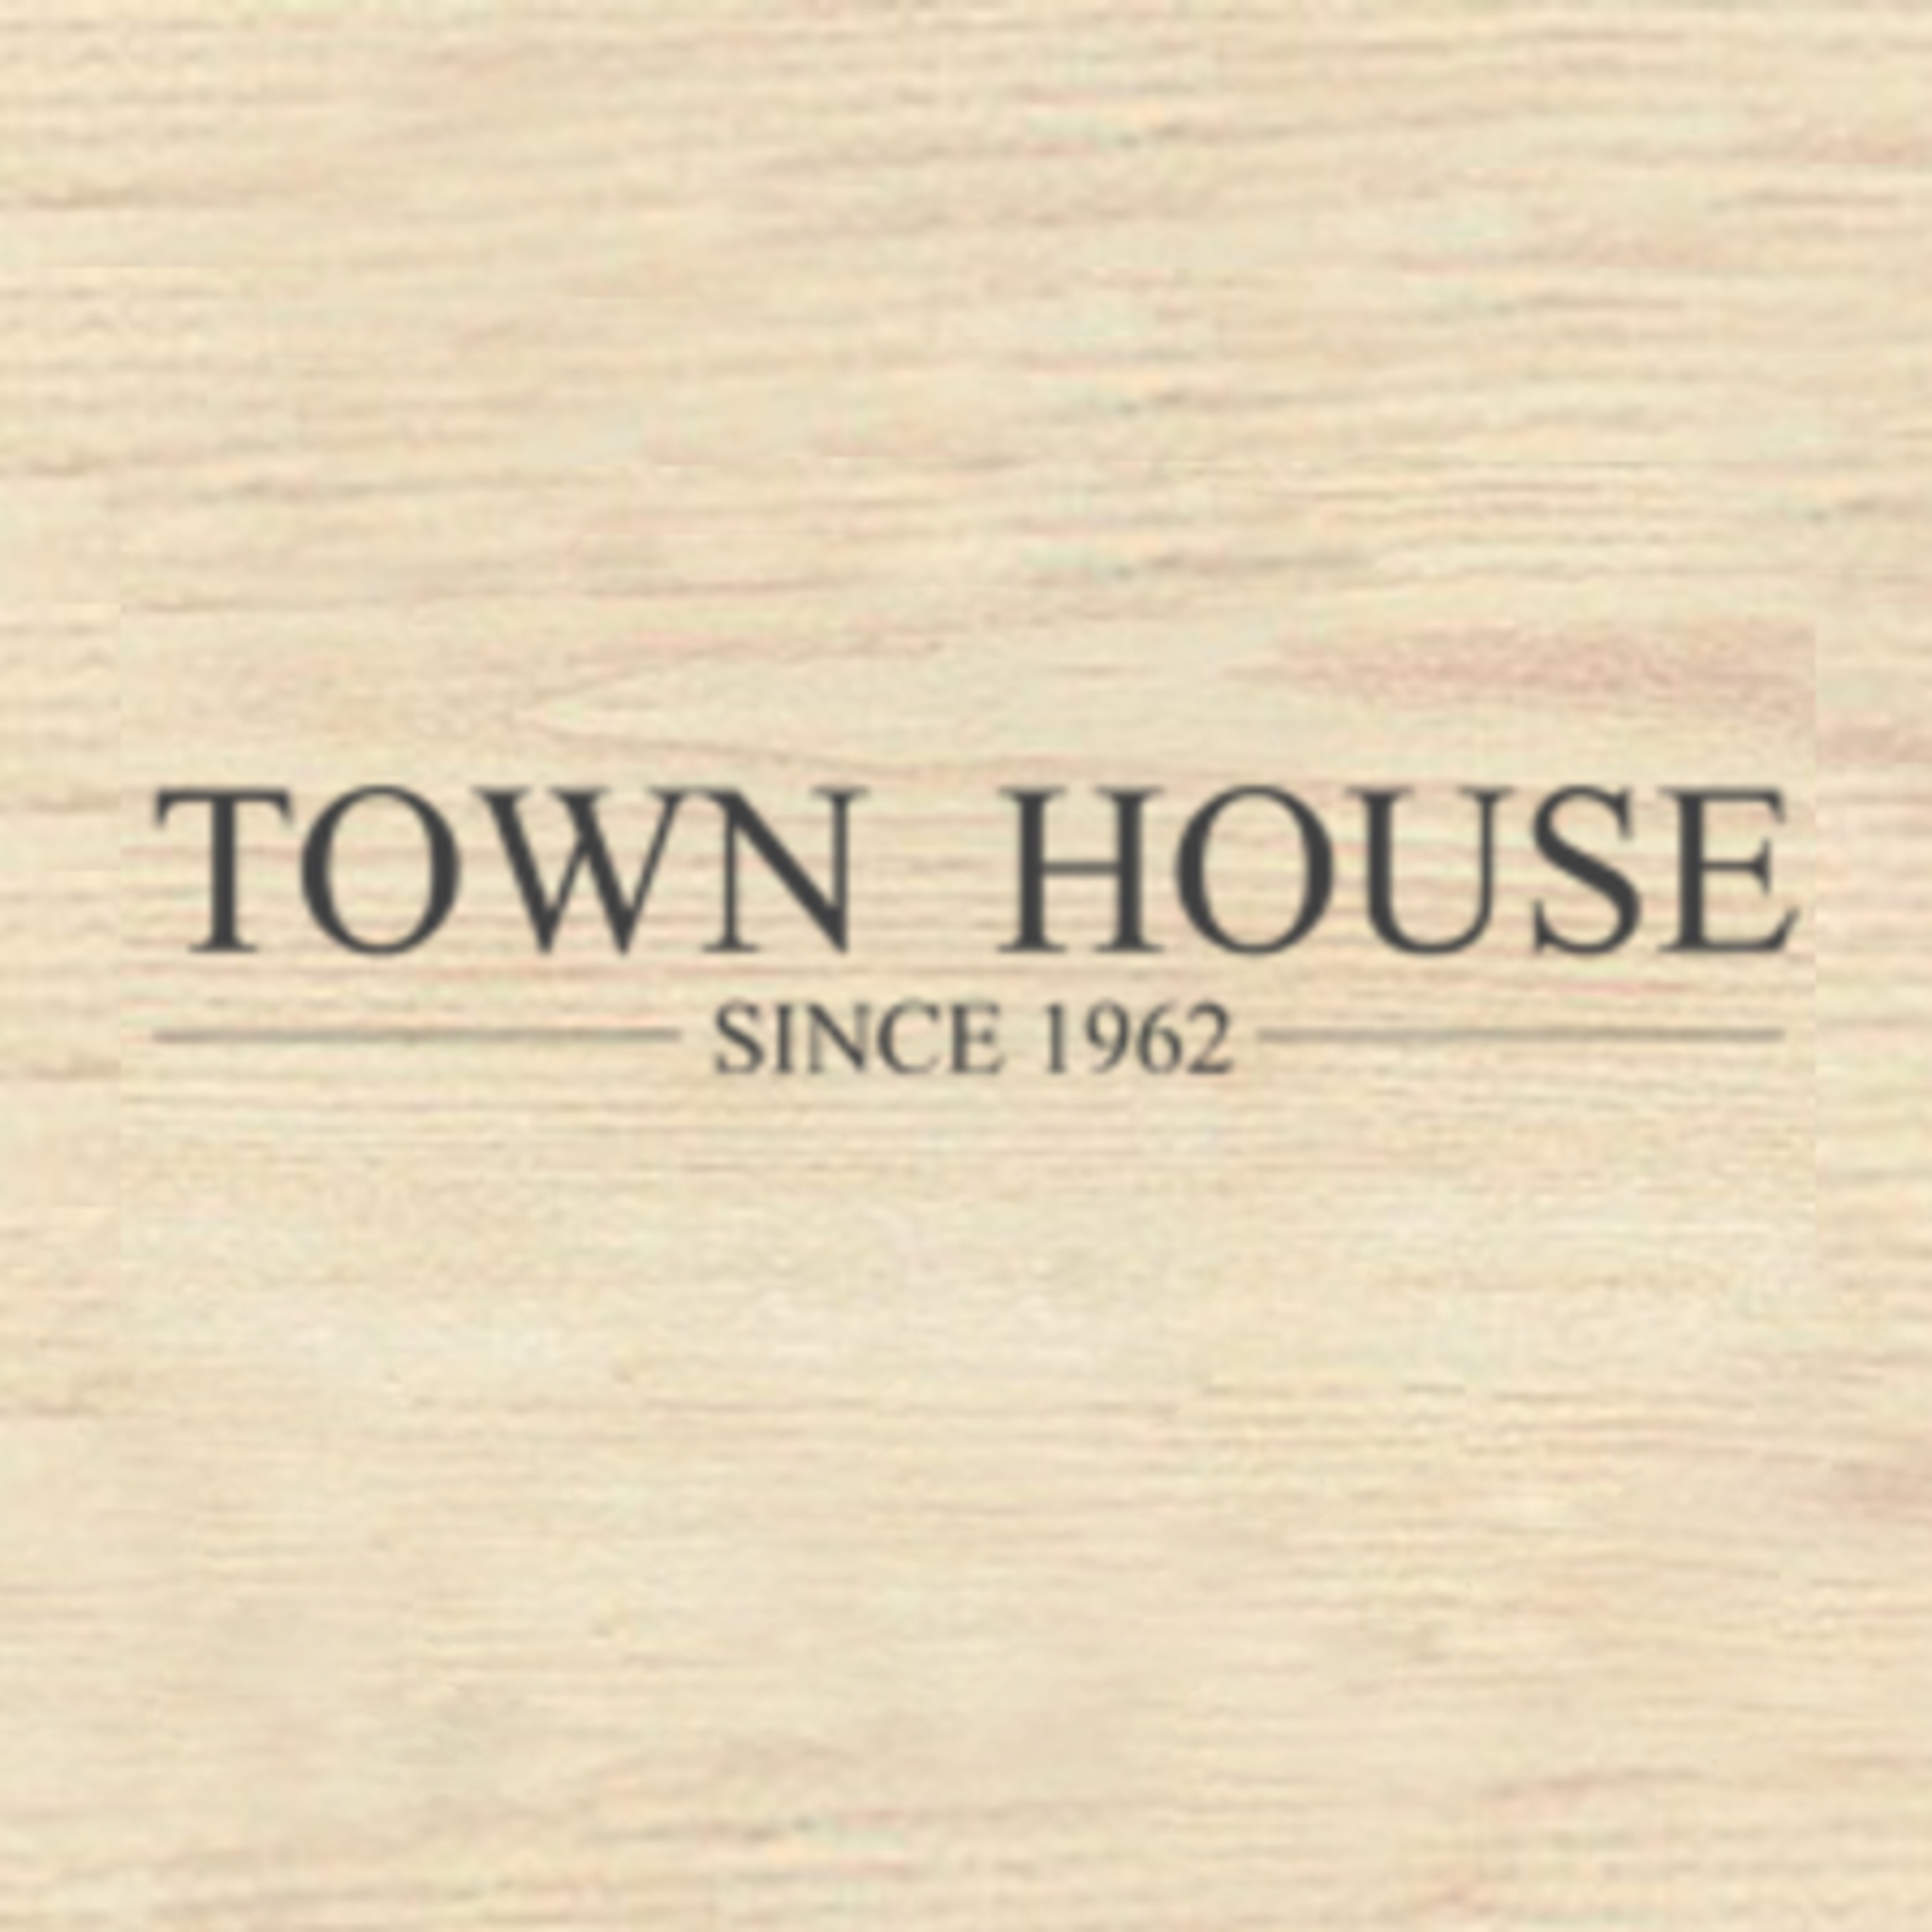 town house- company logo